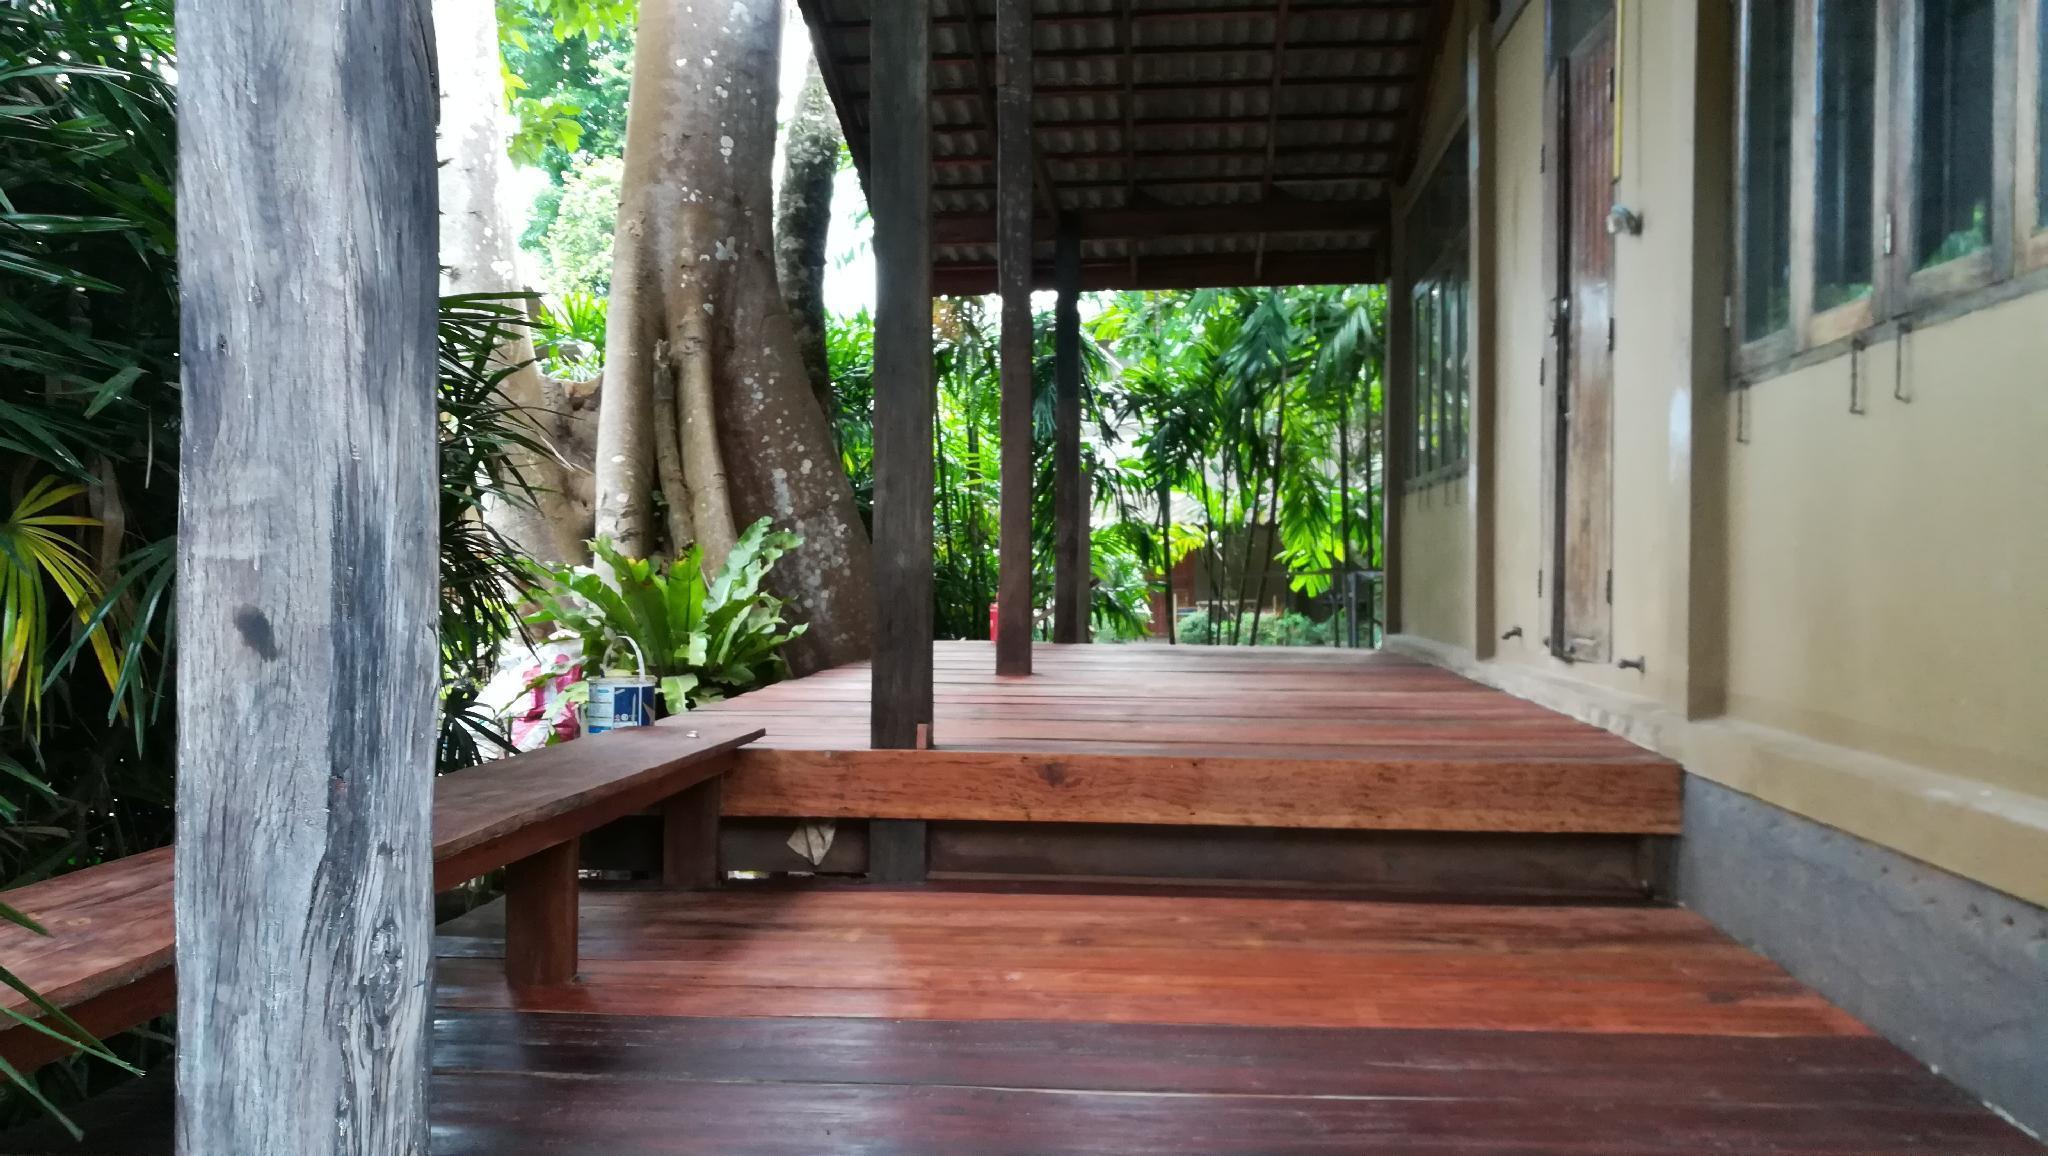 Koh Chang Residence Big Tree House S692 บ้านเดี่ยว 2 ห้องนอน 2 ห้องน้ำส่วนตัว ขนาด 54 ตร.ม. – หาดไก่แบ้